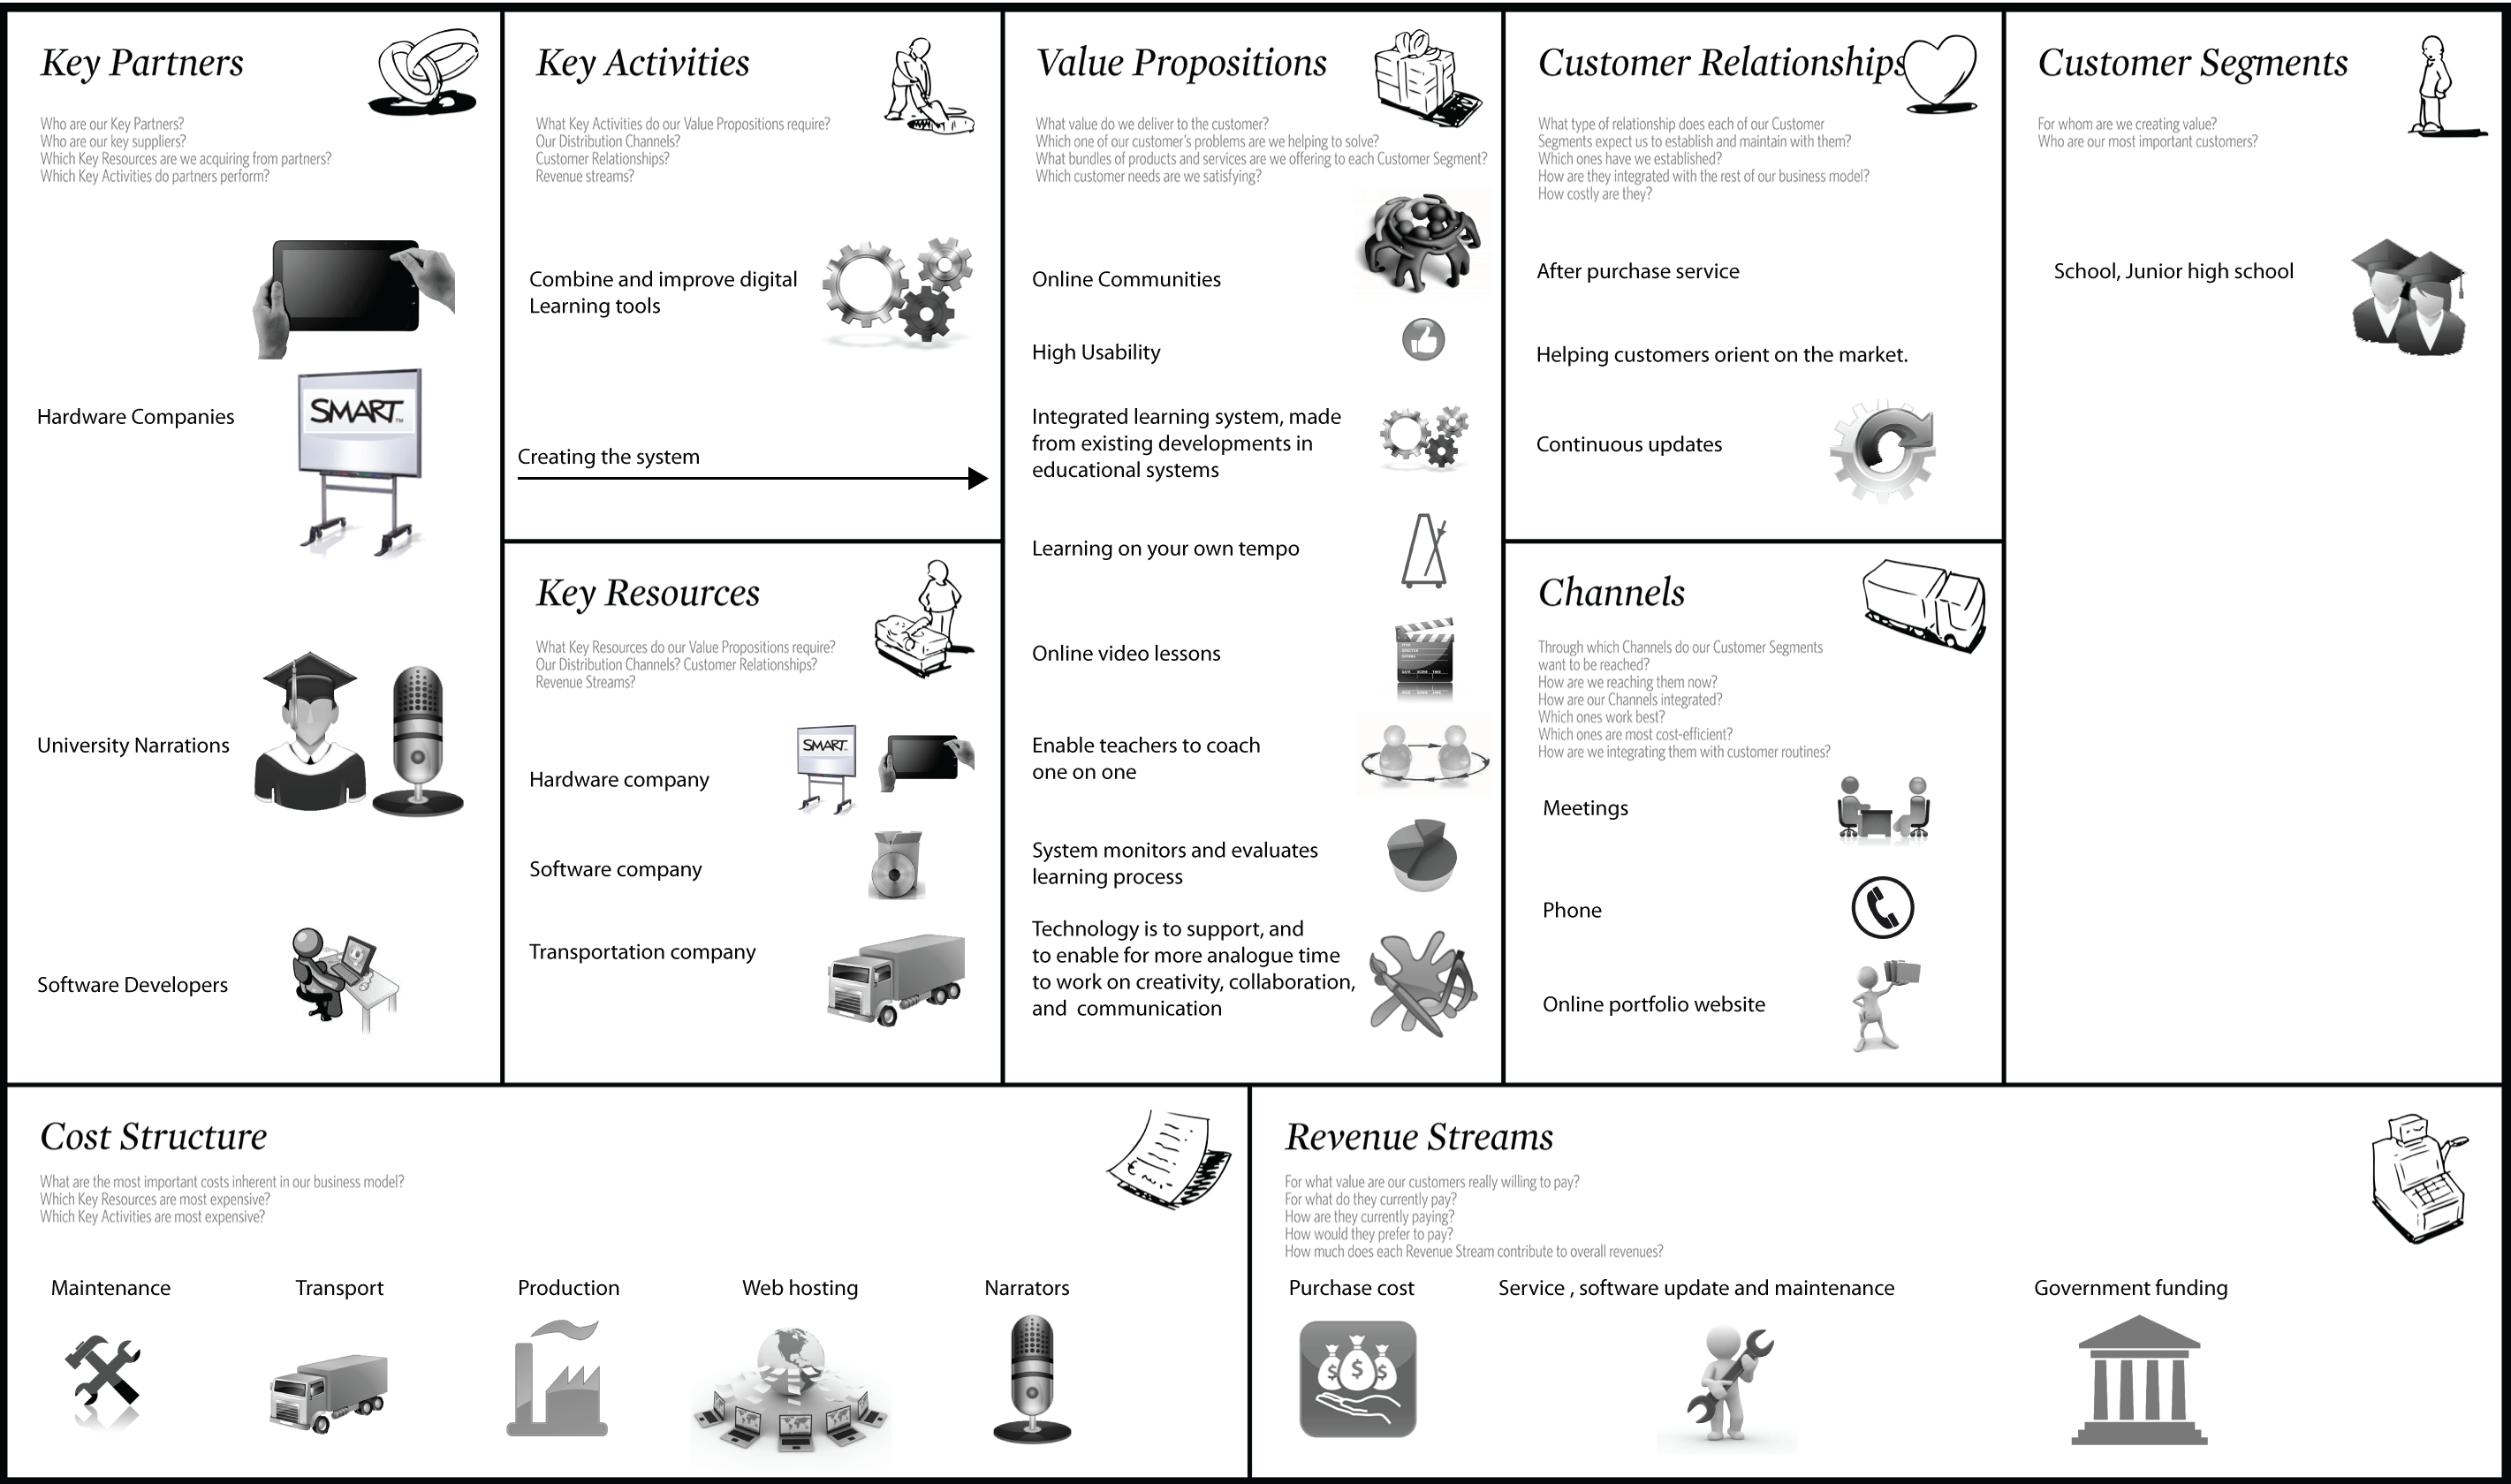 starbucks customer service training manual pdf